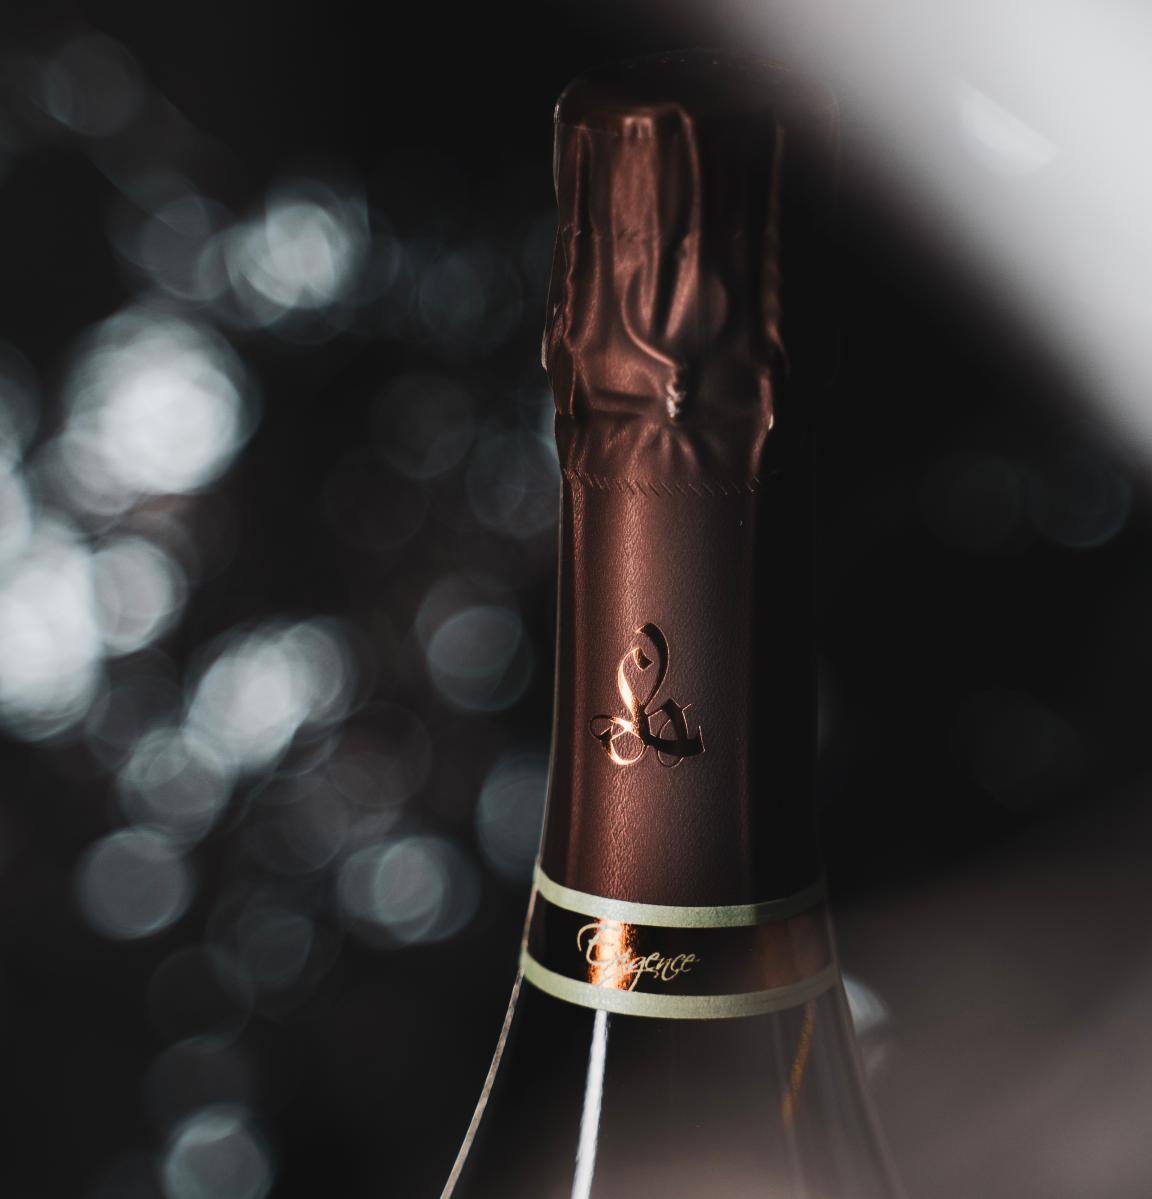 Exigence Brut - Champagne Legras & Haas